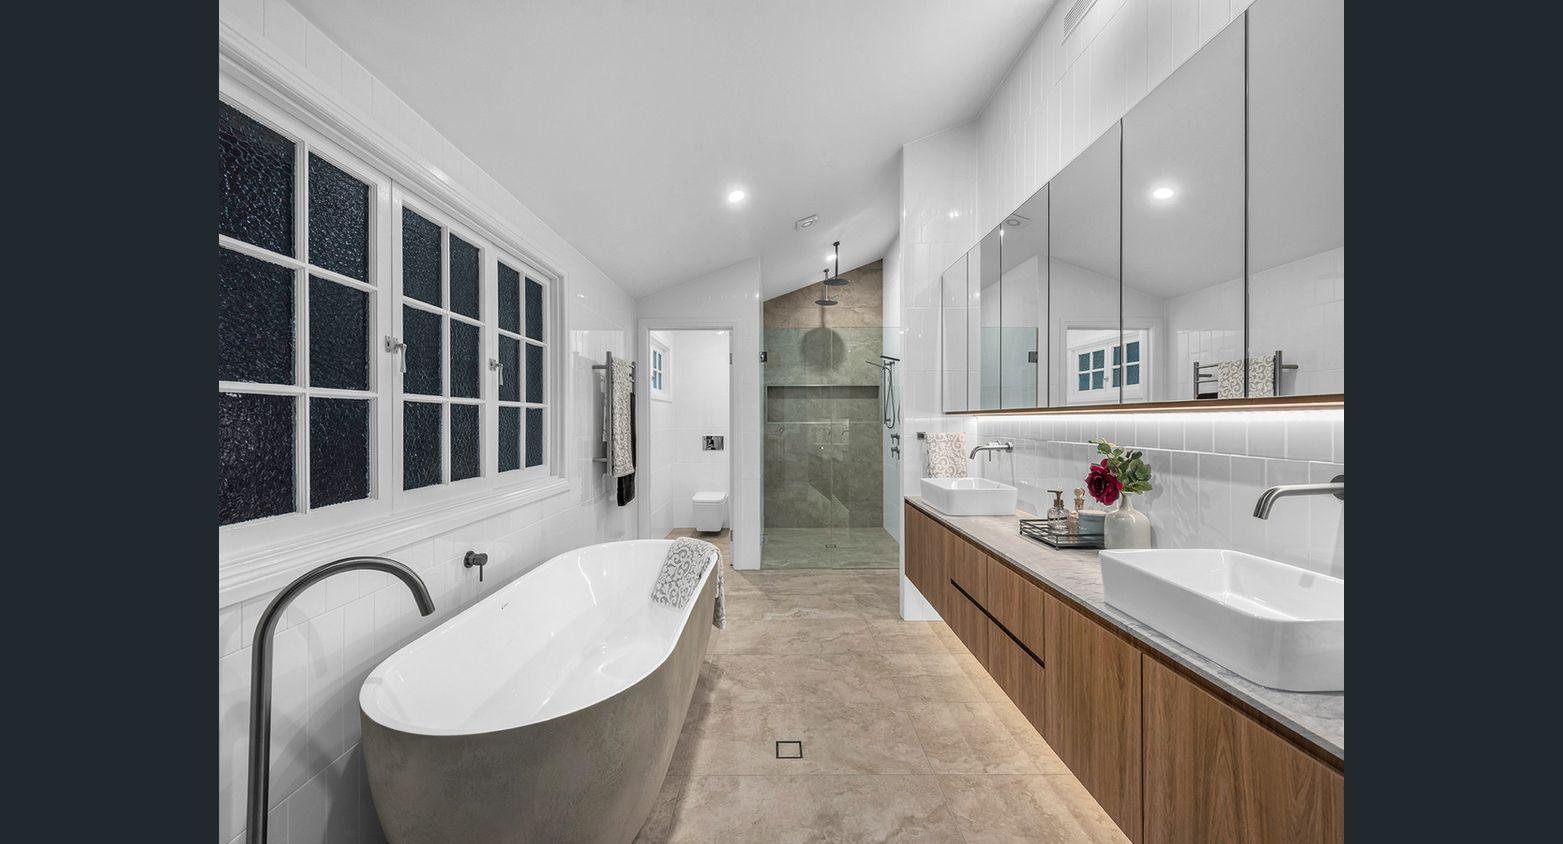 Detalle de este baño con bañera al aire